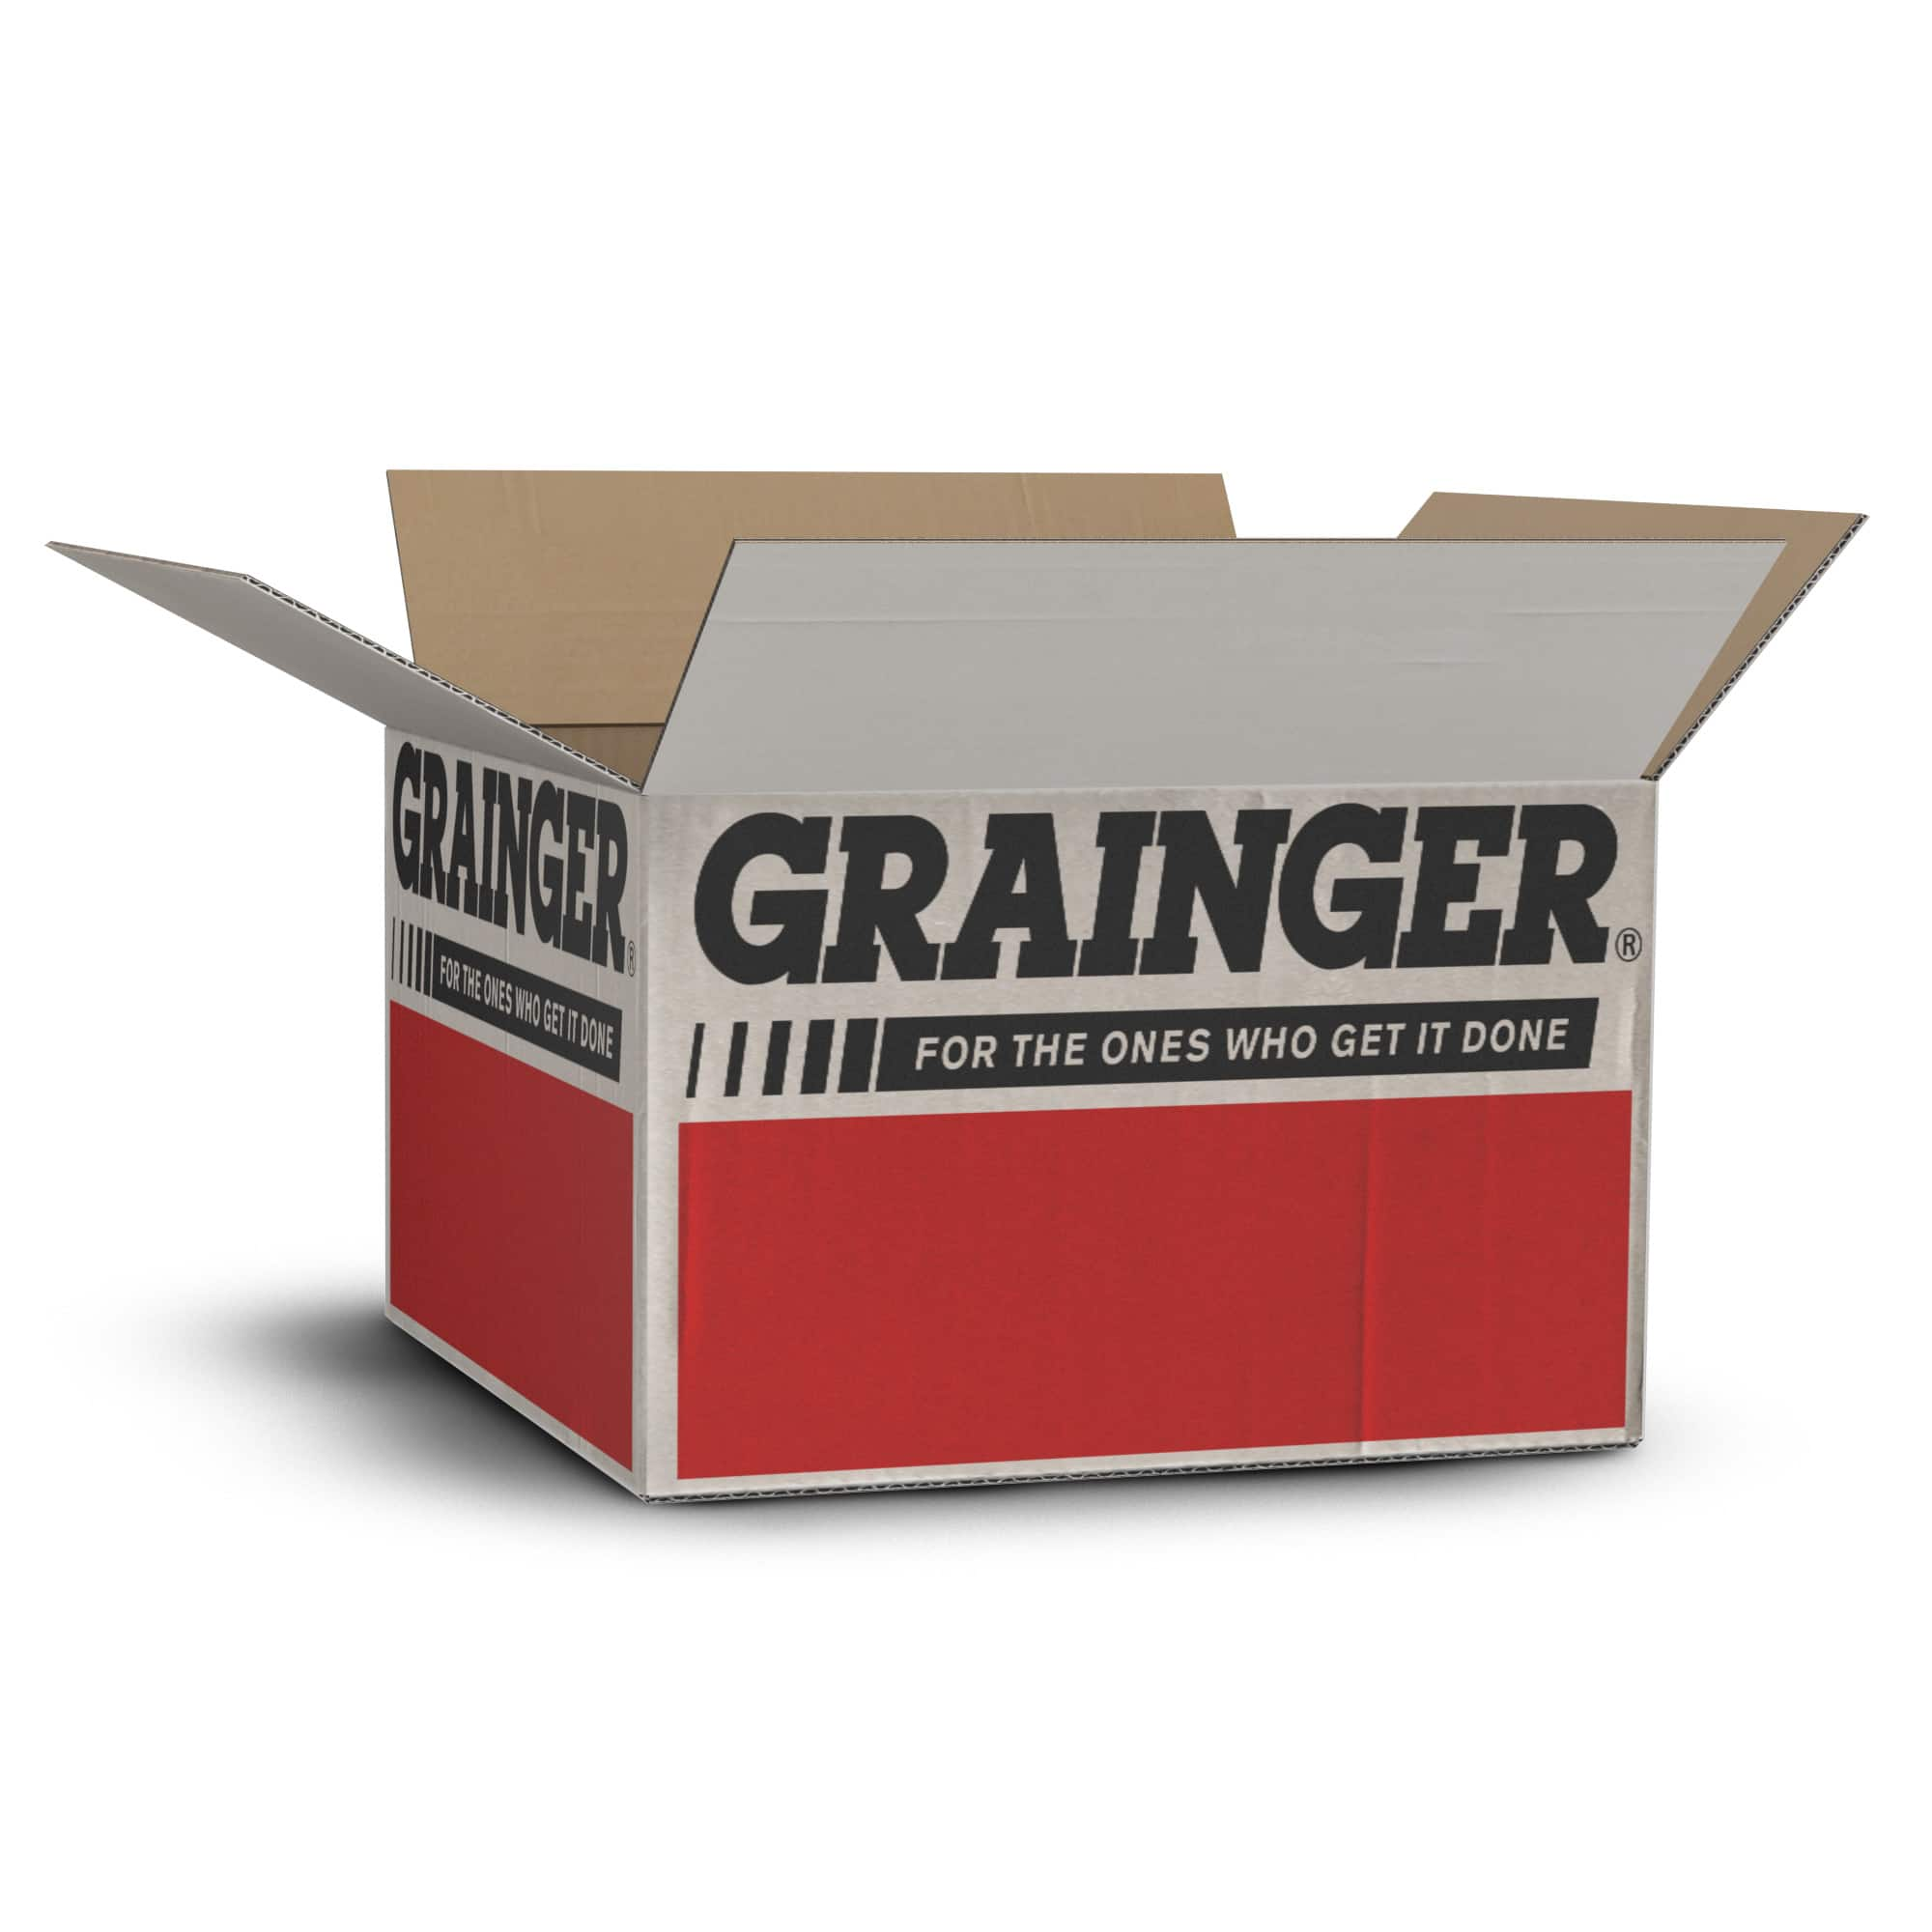 Grainger N95 respirators (back ordered) $47.75